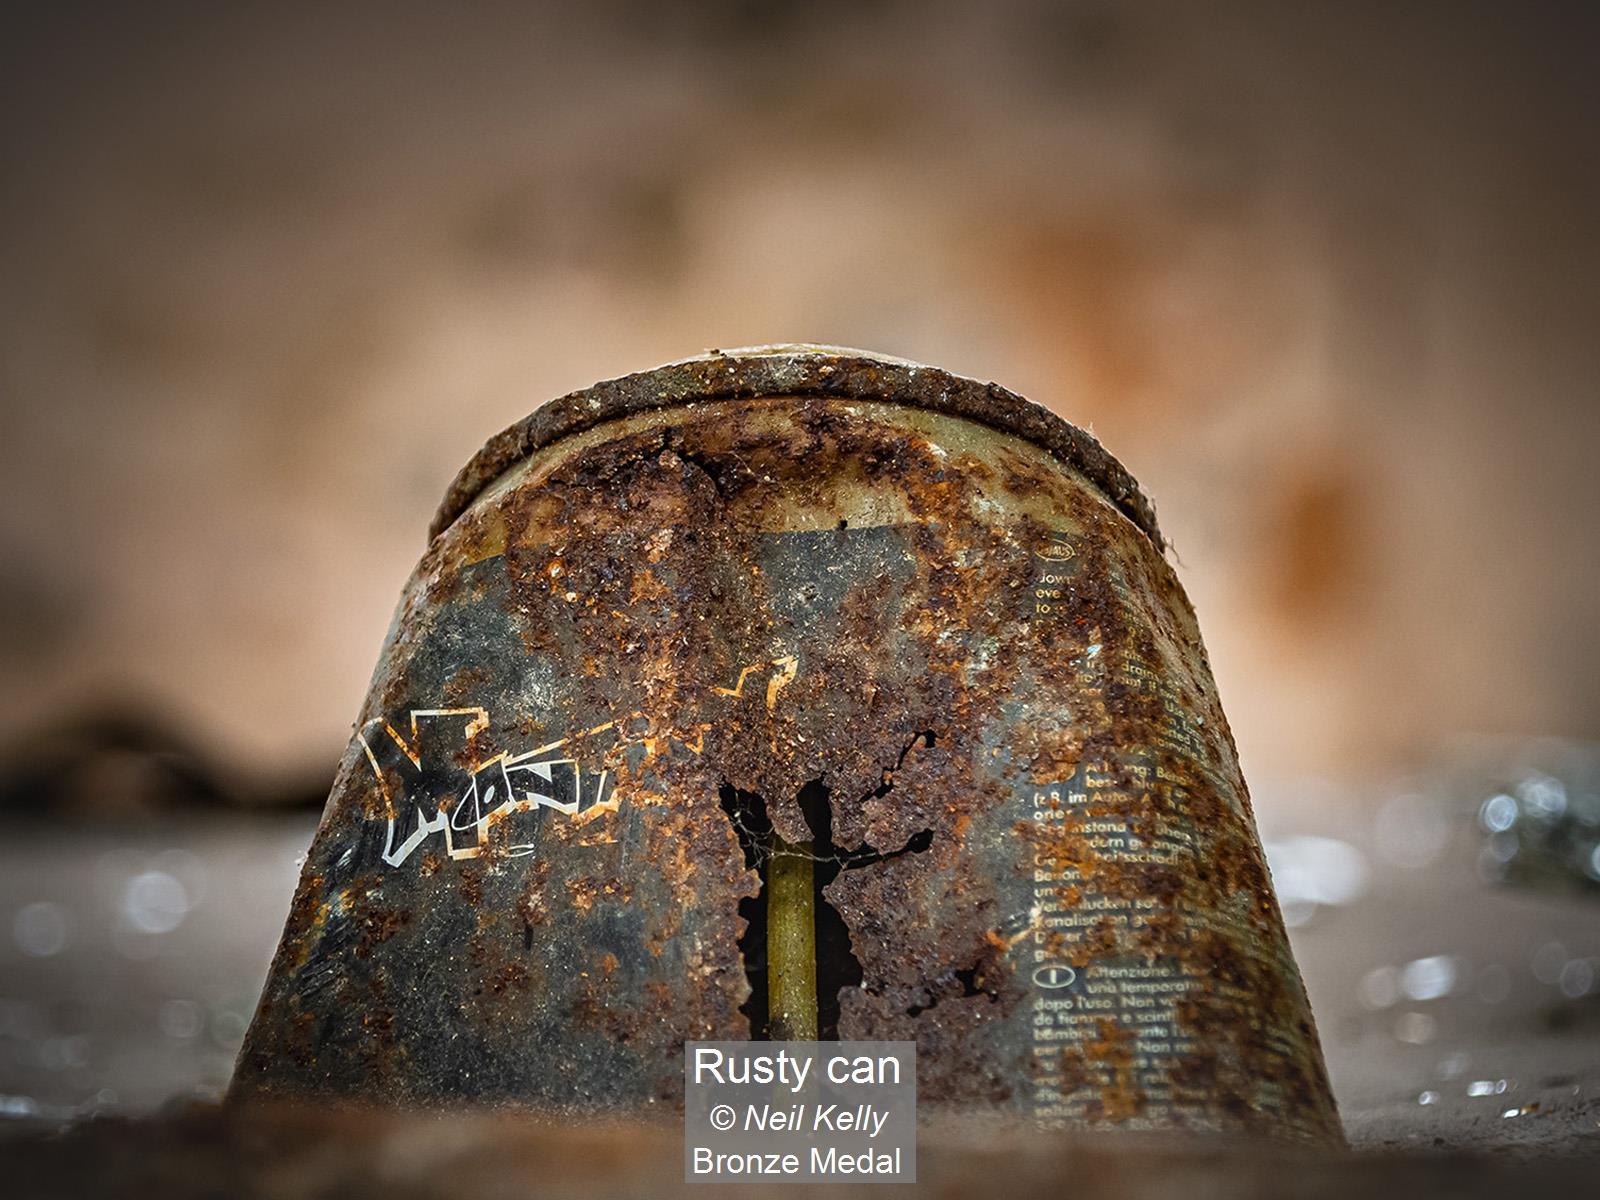 Rusty can_Neil Kelly_Bronze